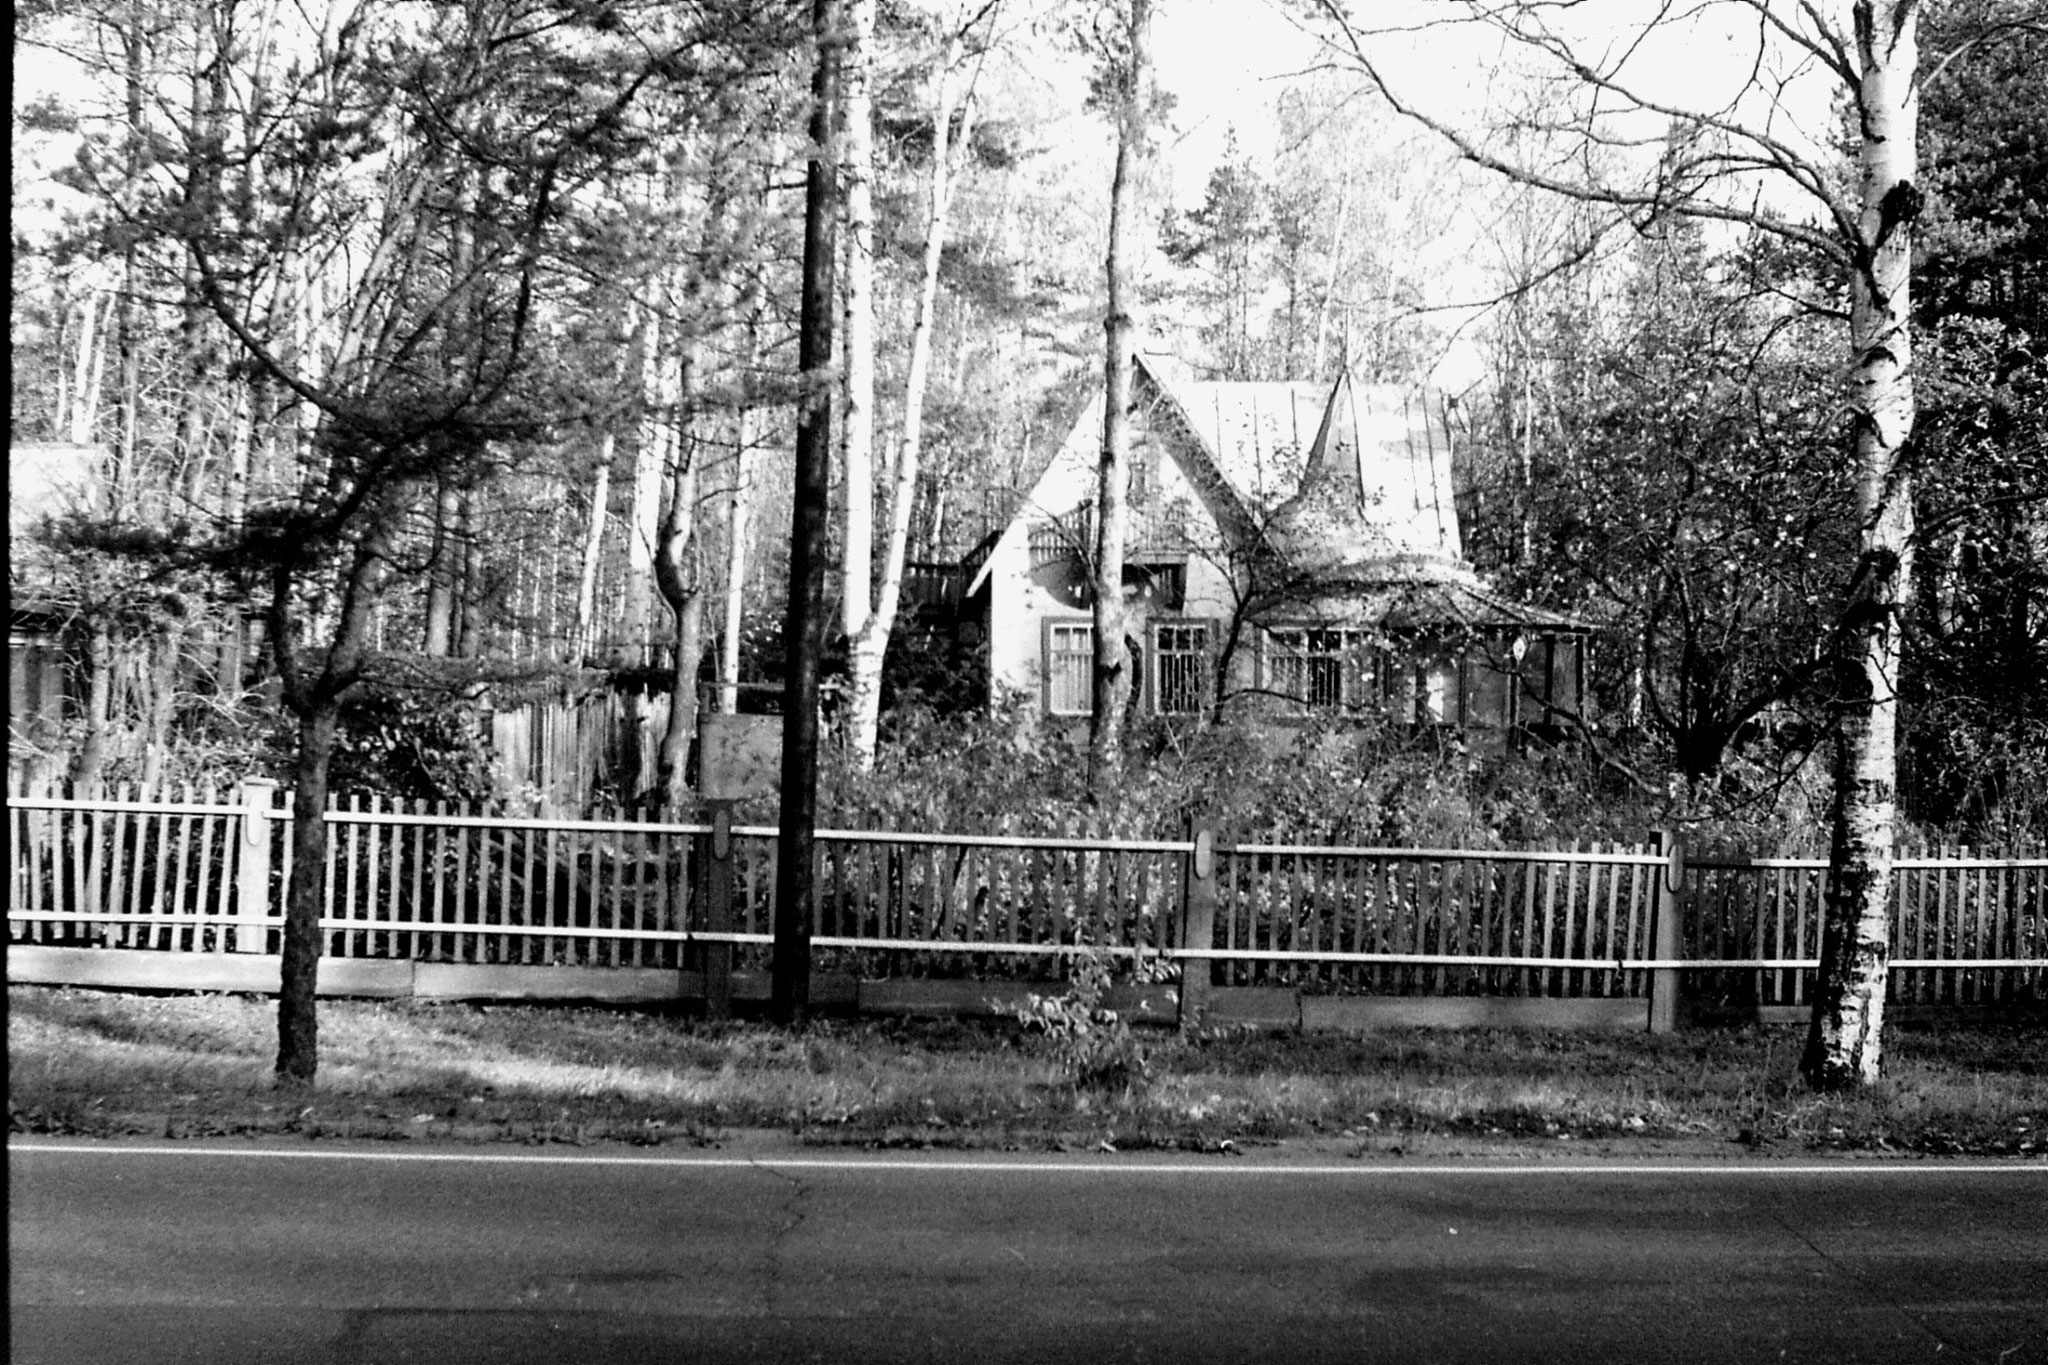 14/10/1988: 19: houses in Olgino